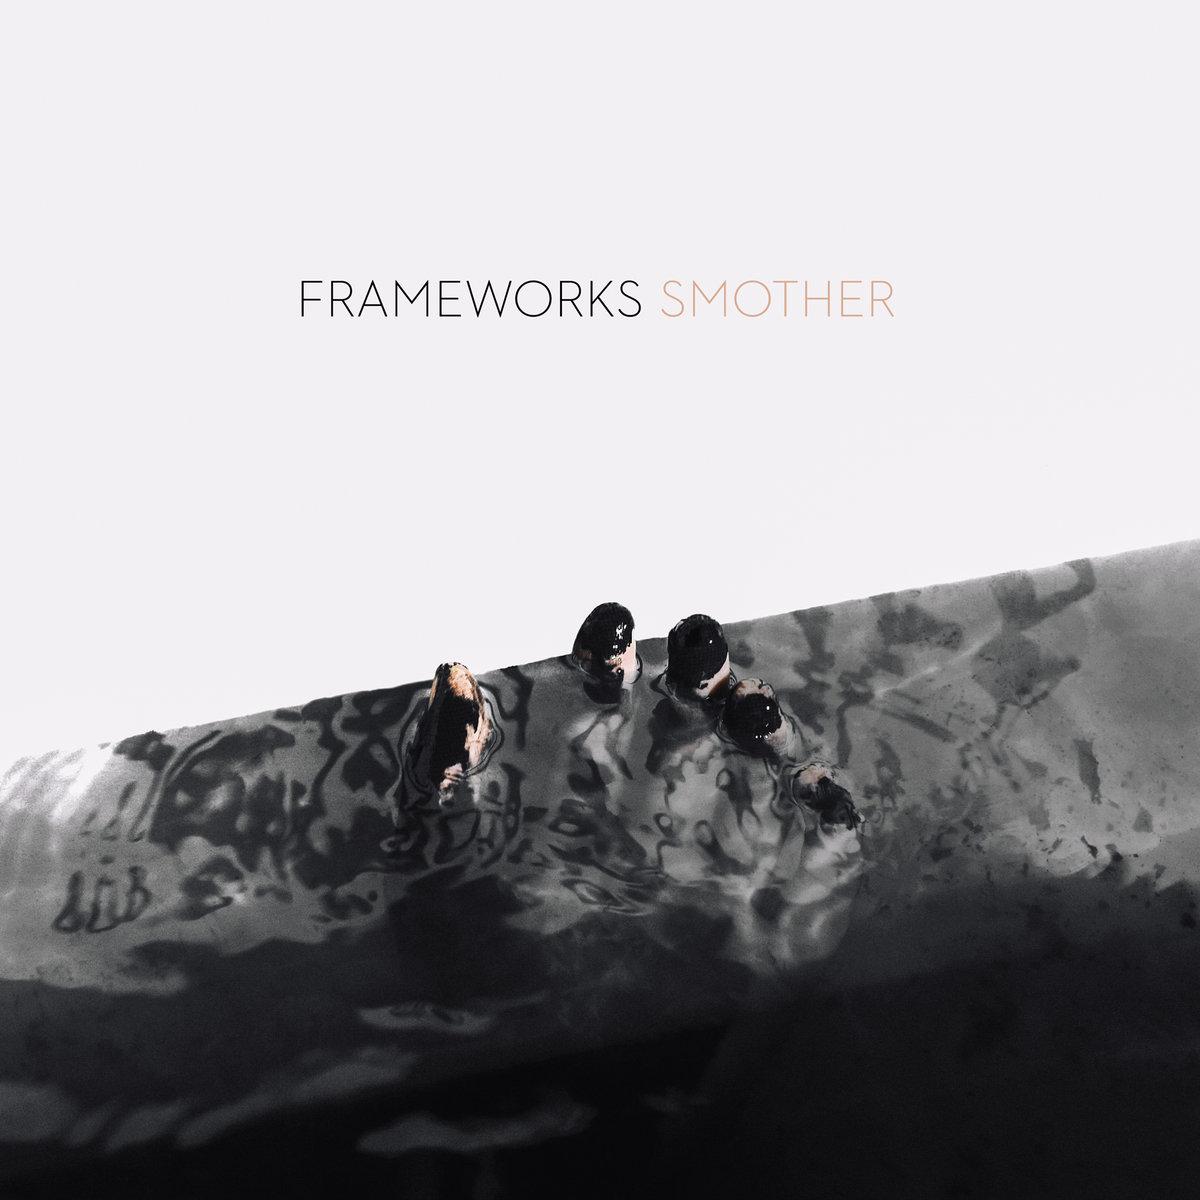 Frameworks - Smother (Deathwish Records)